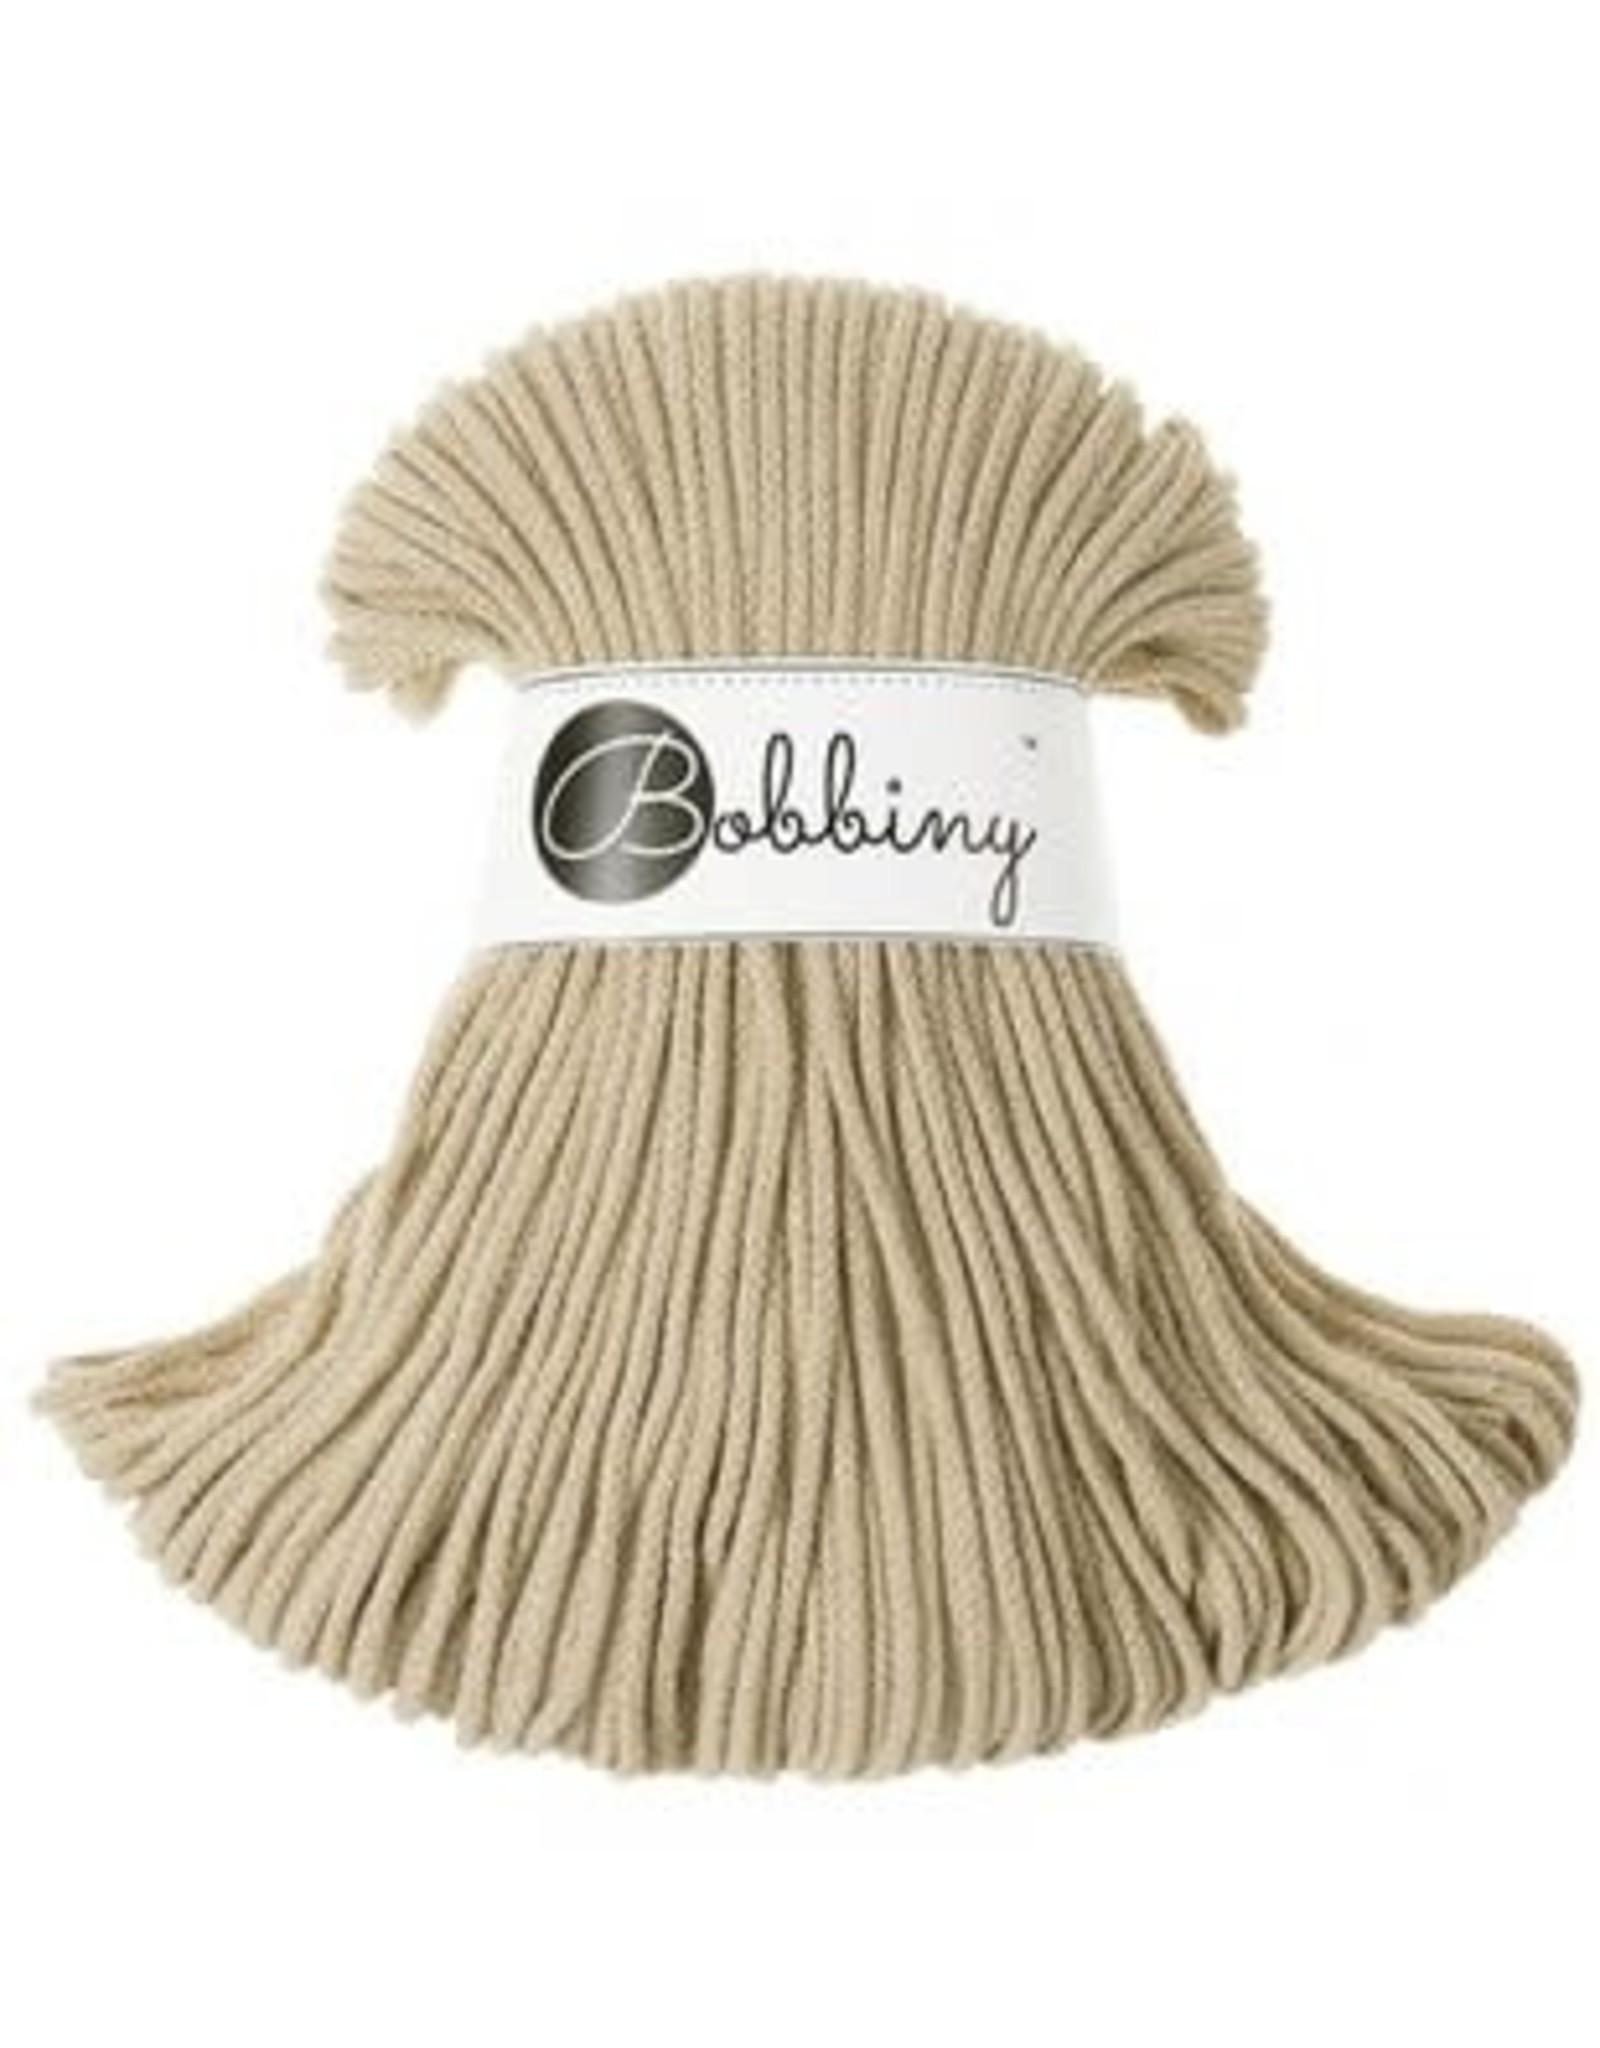 Bobbiny Bobbiny - Premium 5MM Beige